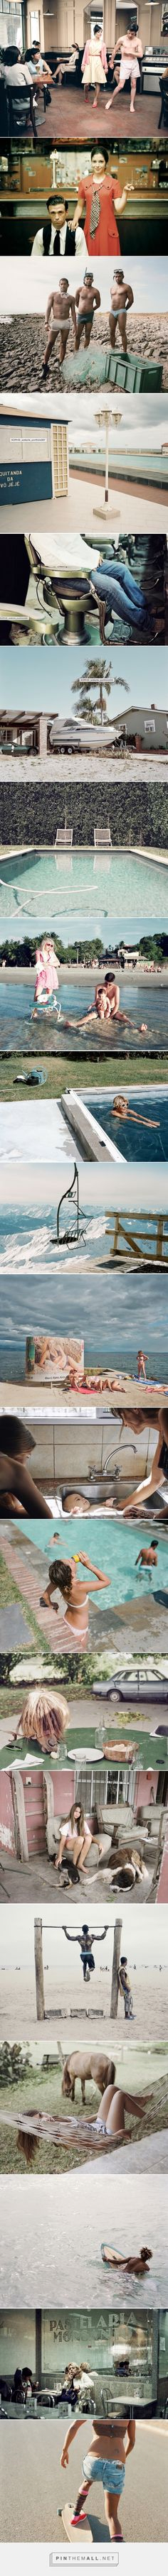 Sophie Ebrard Photography – Fubiz™ - created via http://pinthemall.net